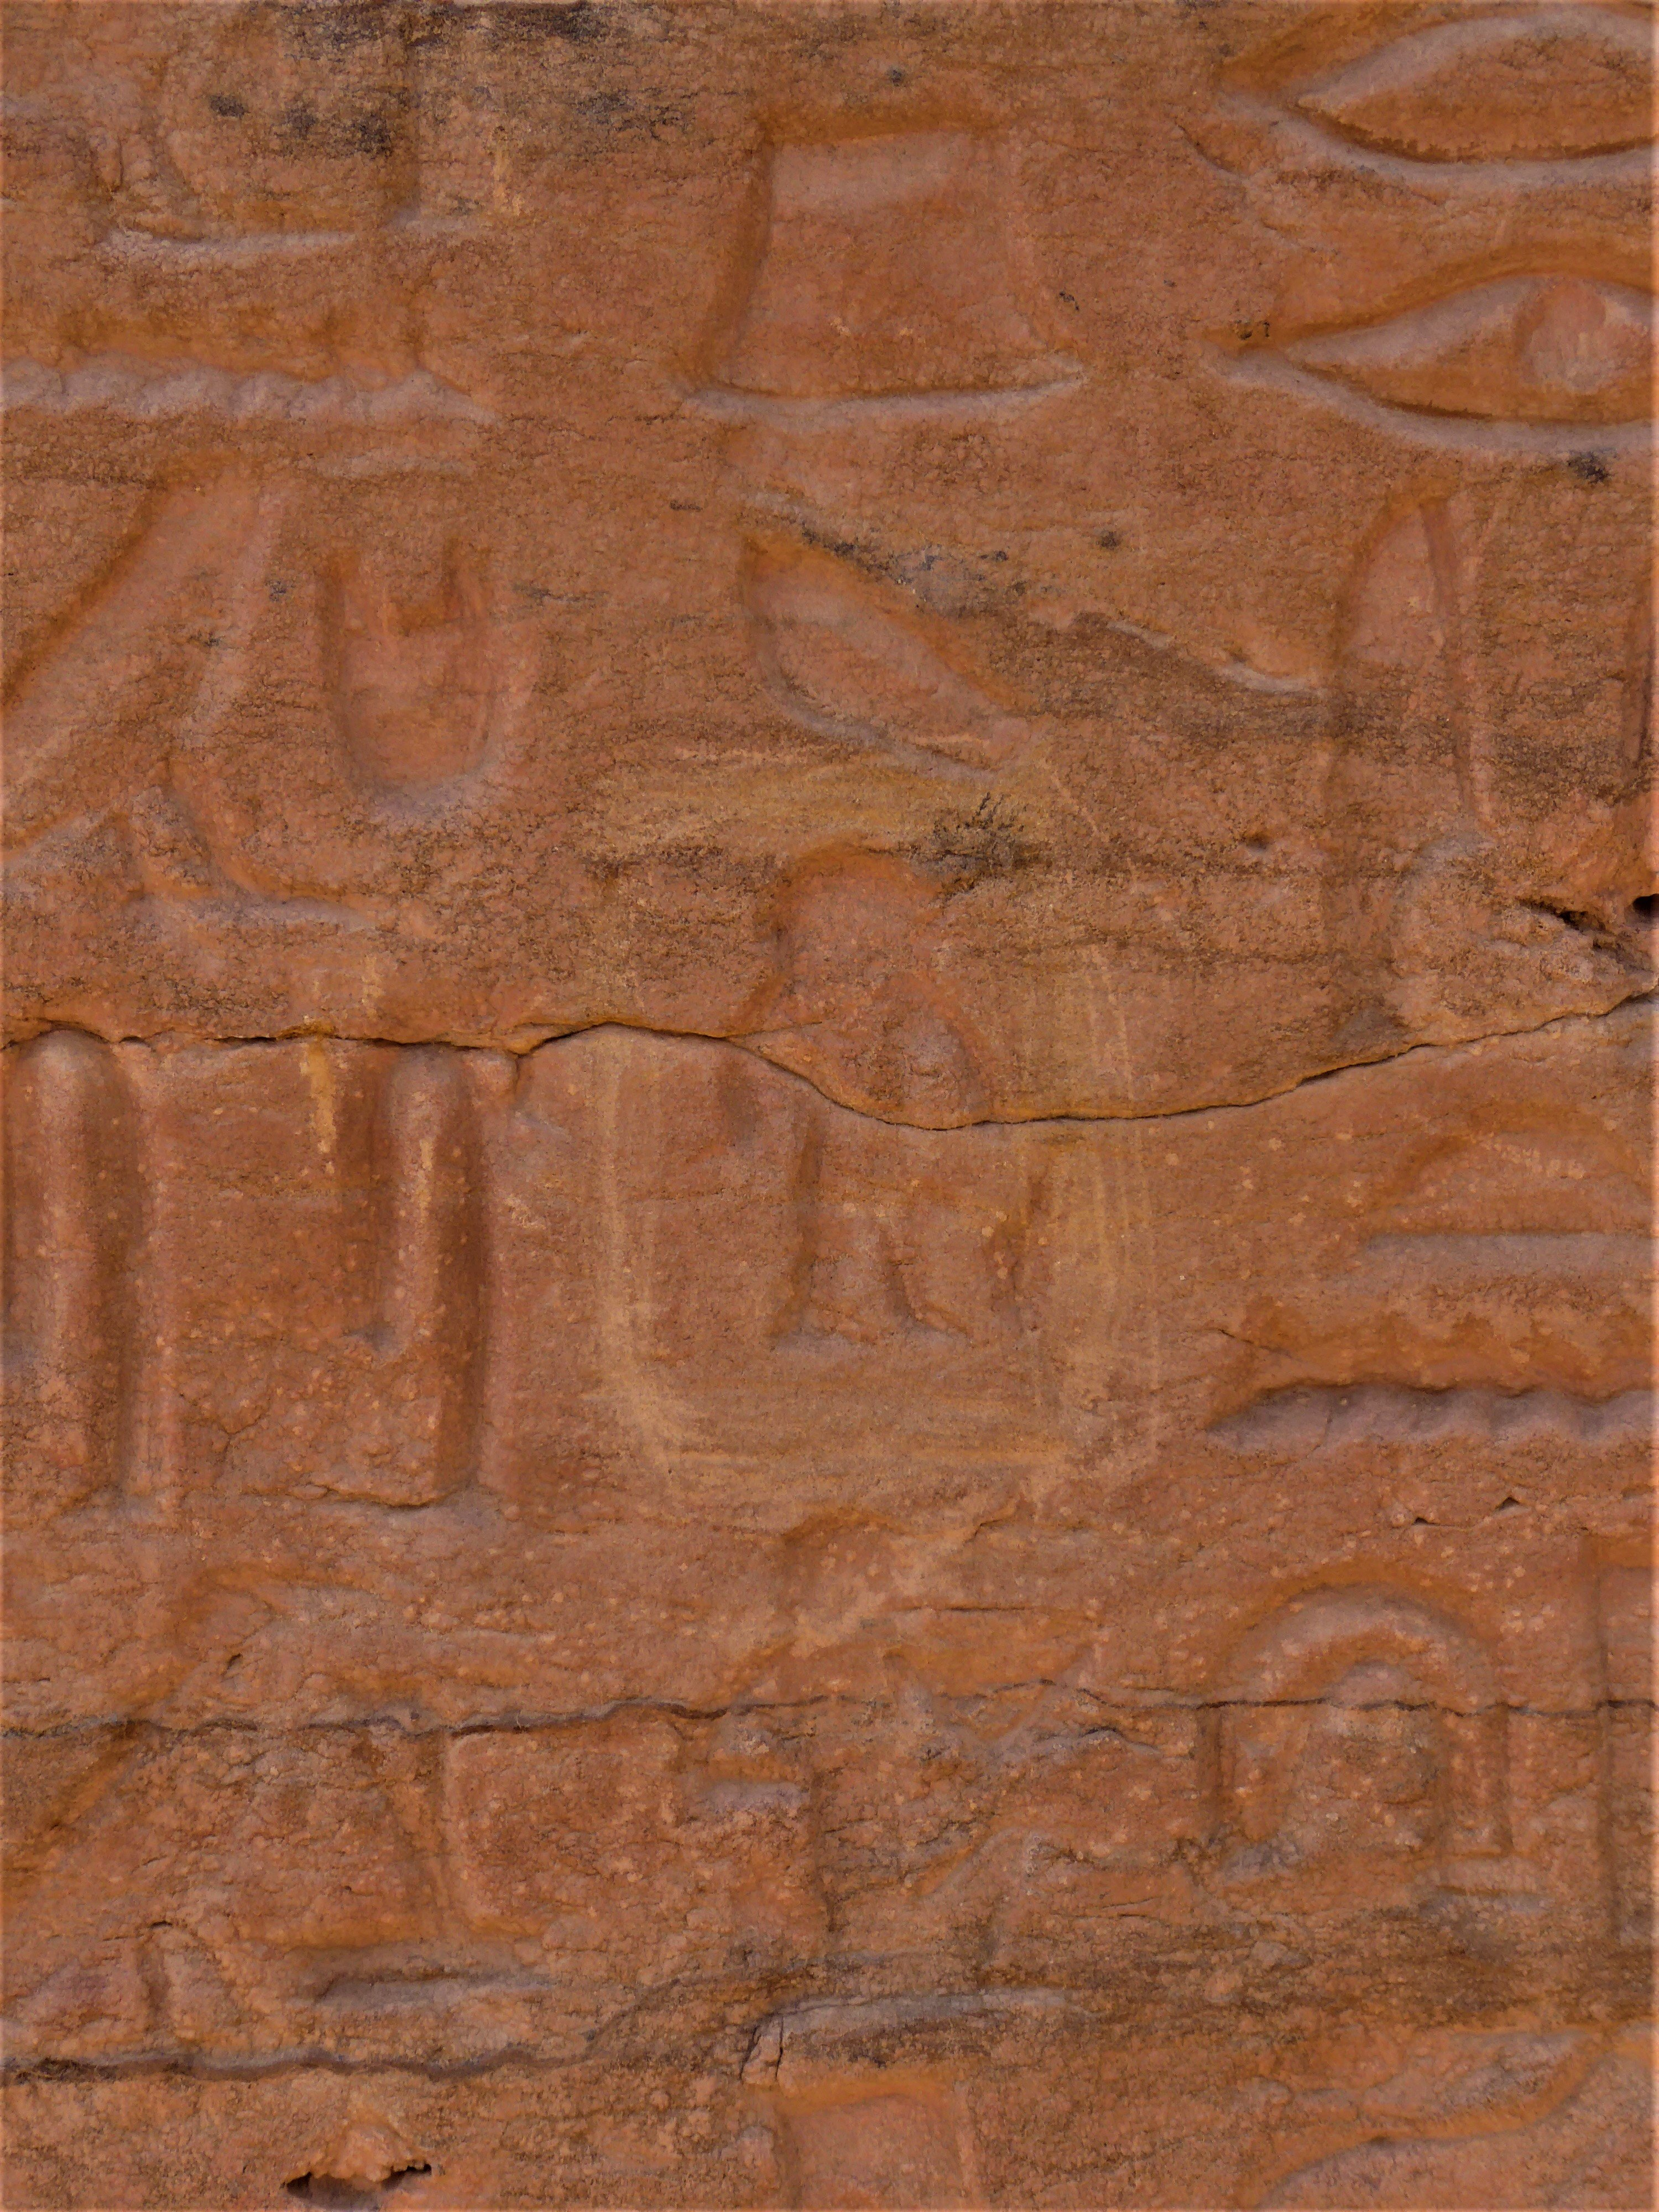 Harkhuf Tomb